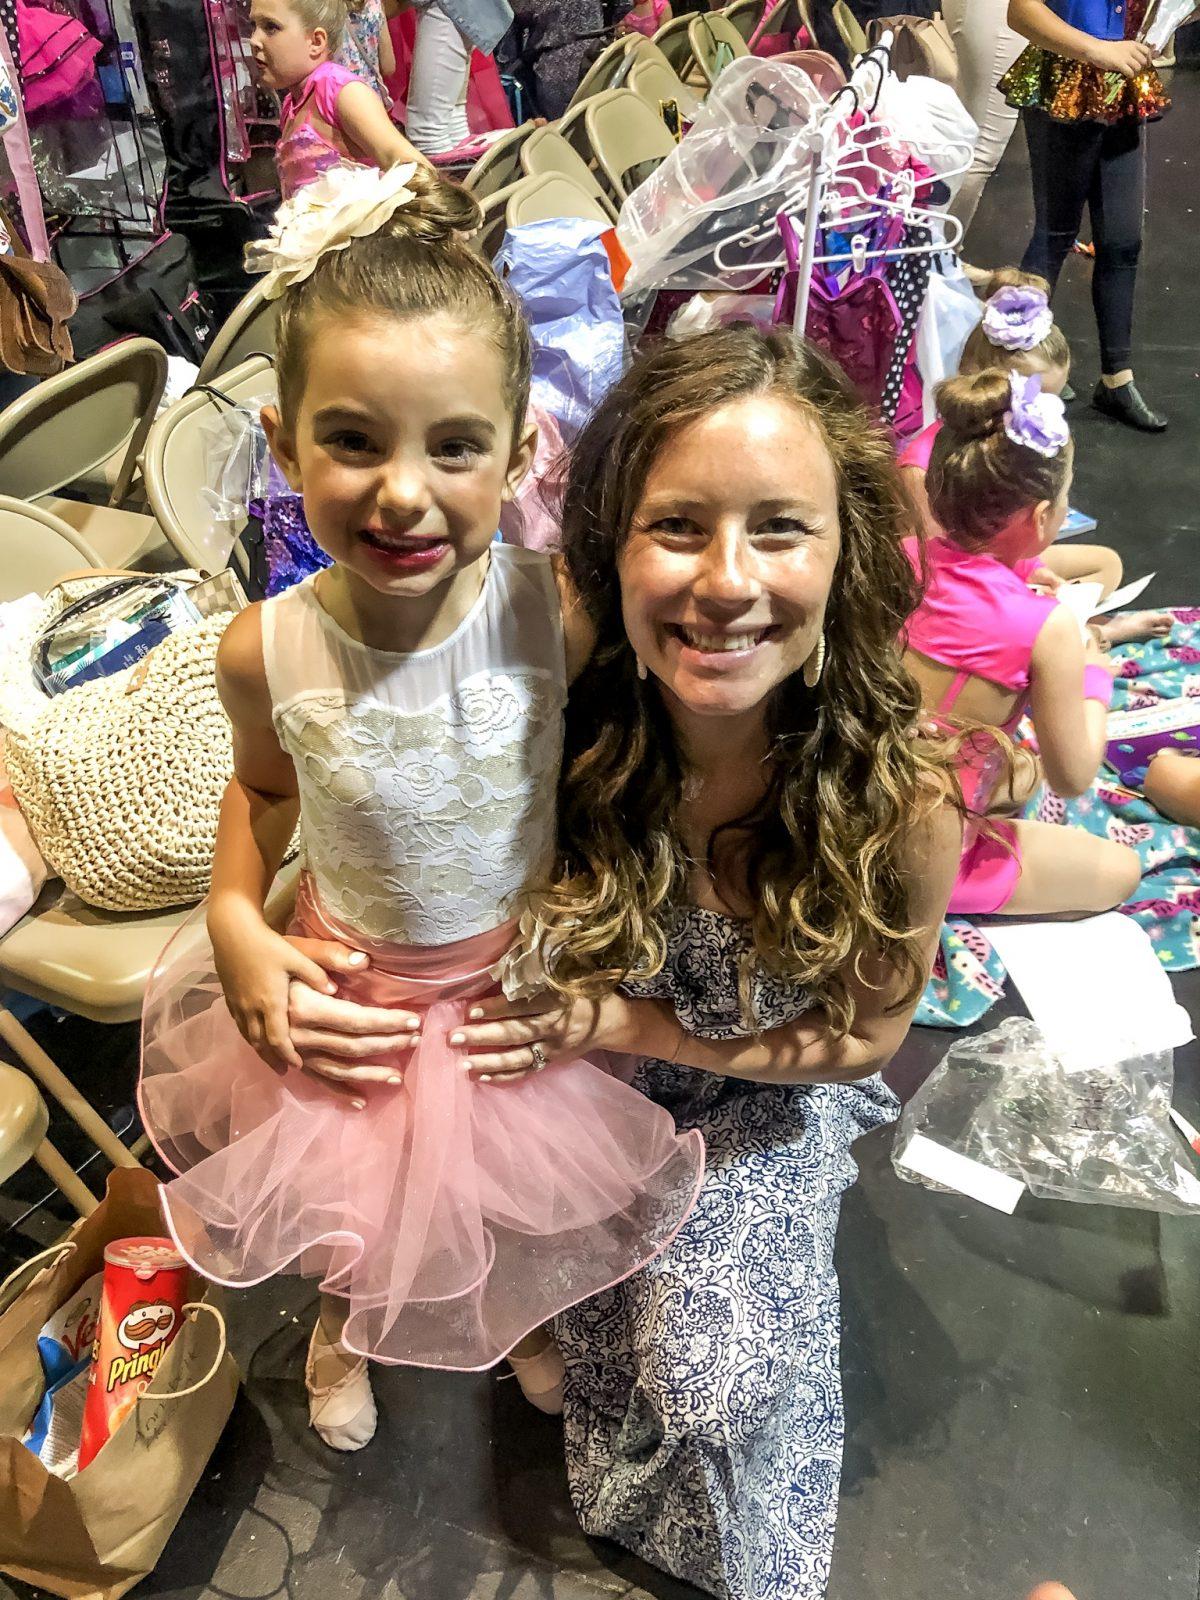 Ballerina after her dance recital with Mom